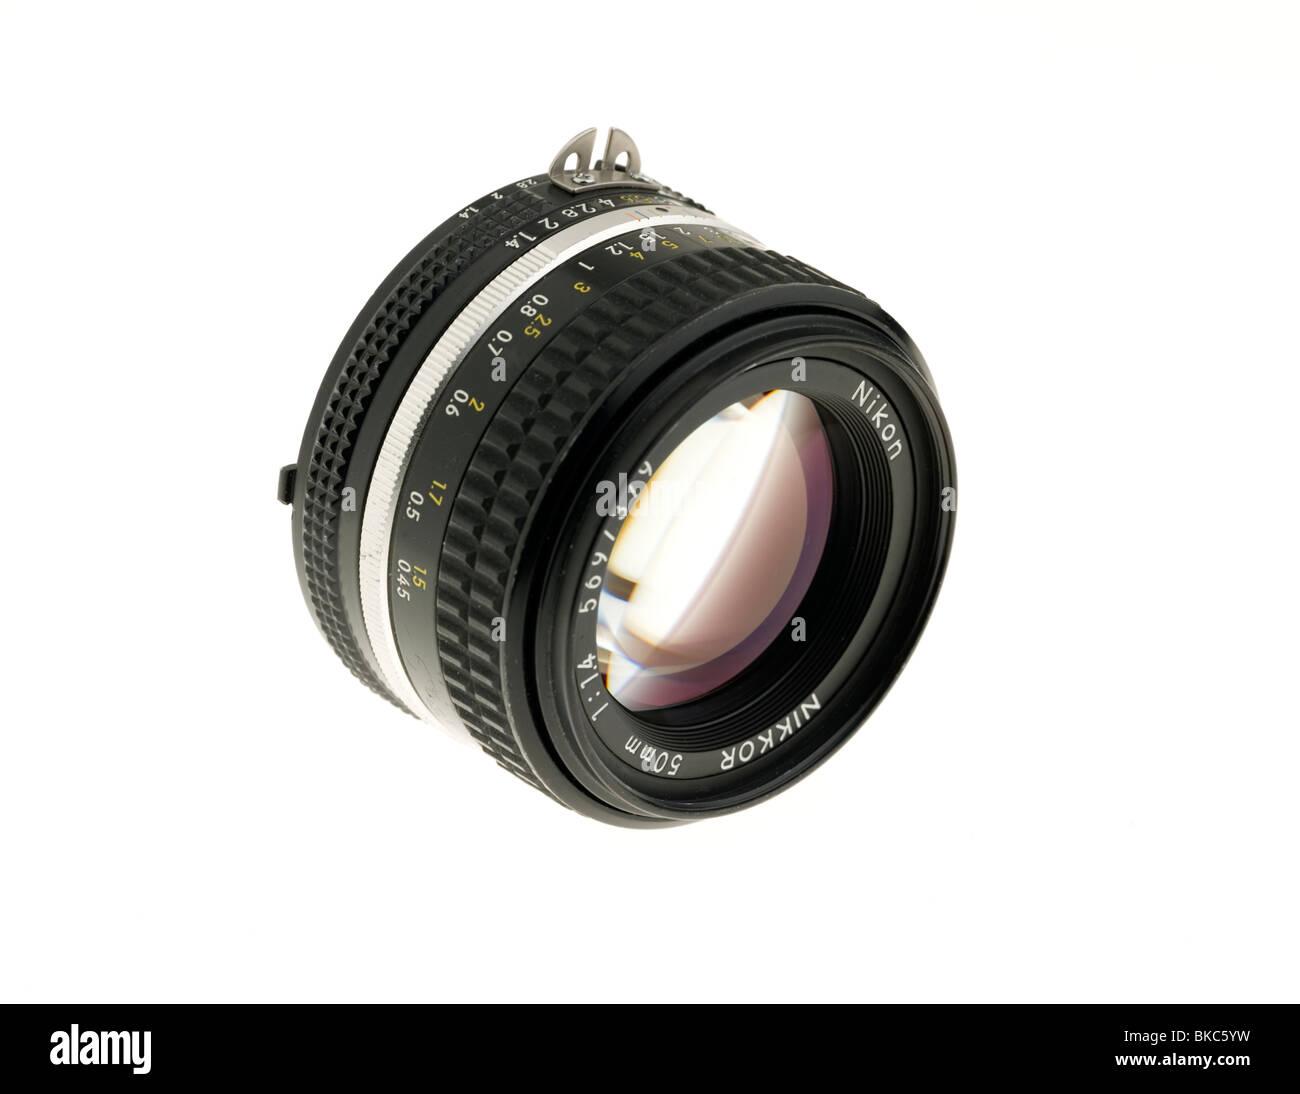 Nikon 50mm lens - Stock Image